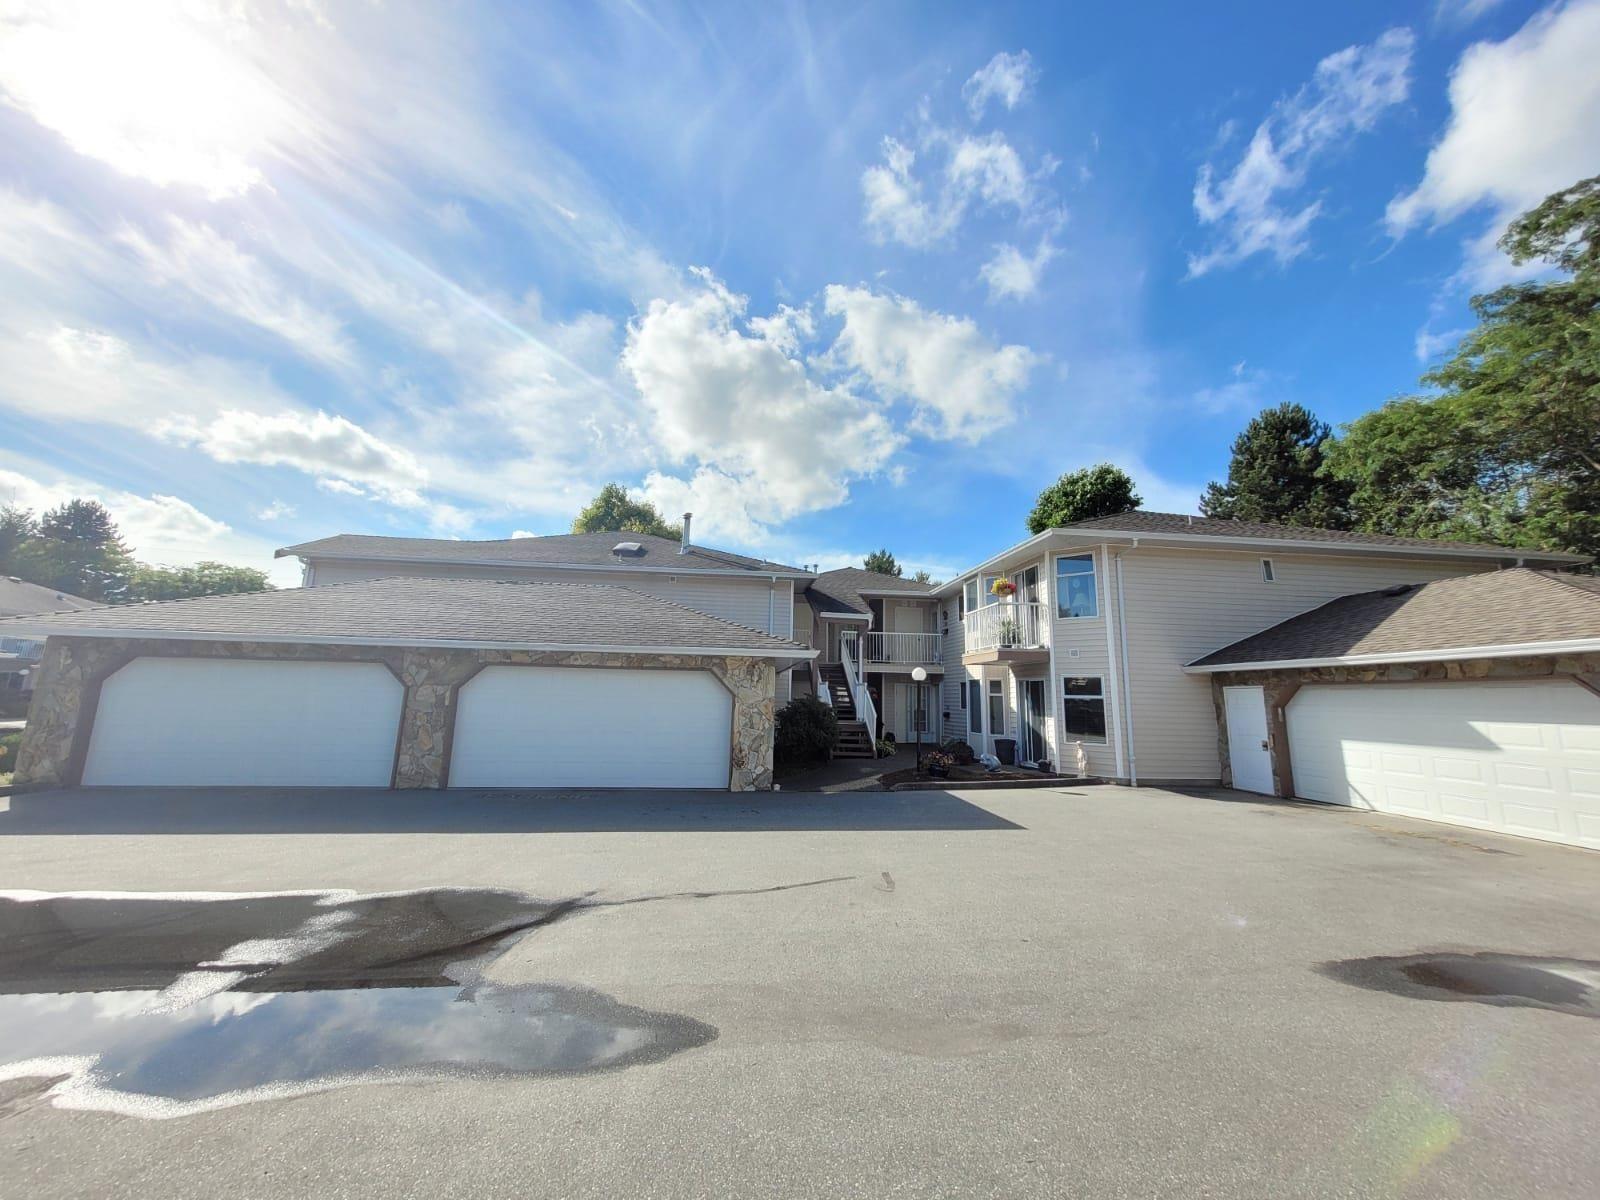 Main Photo: 212 6875 121 Street in Surrey: West Newton Condo for sale : MLS®# R2617727